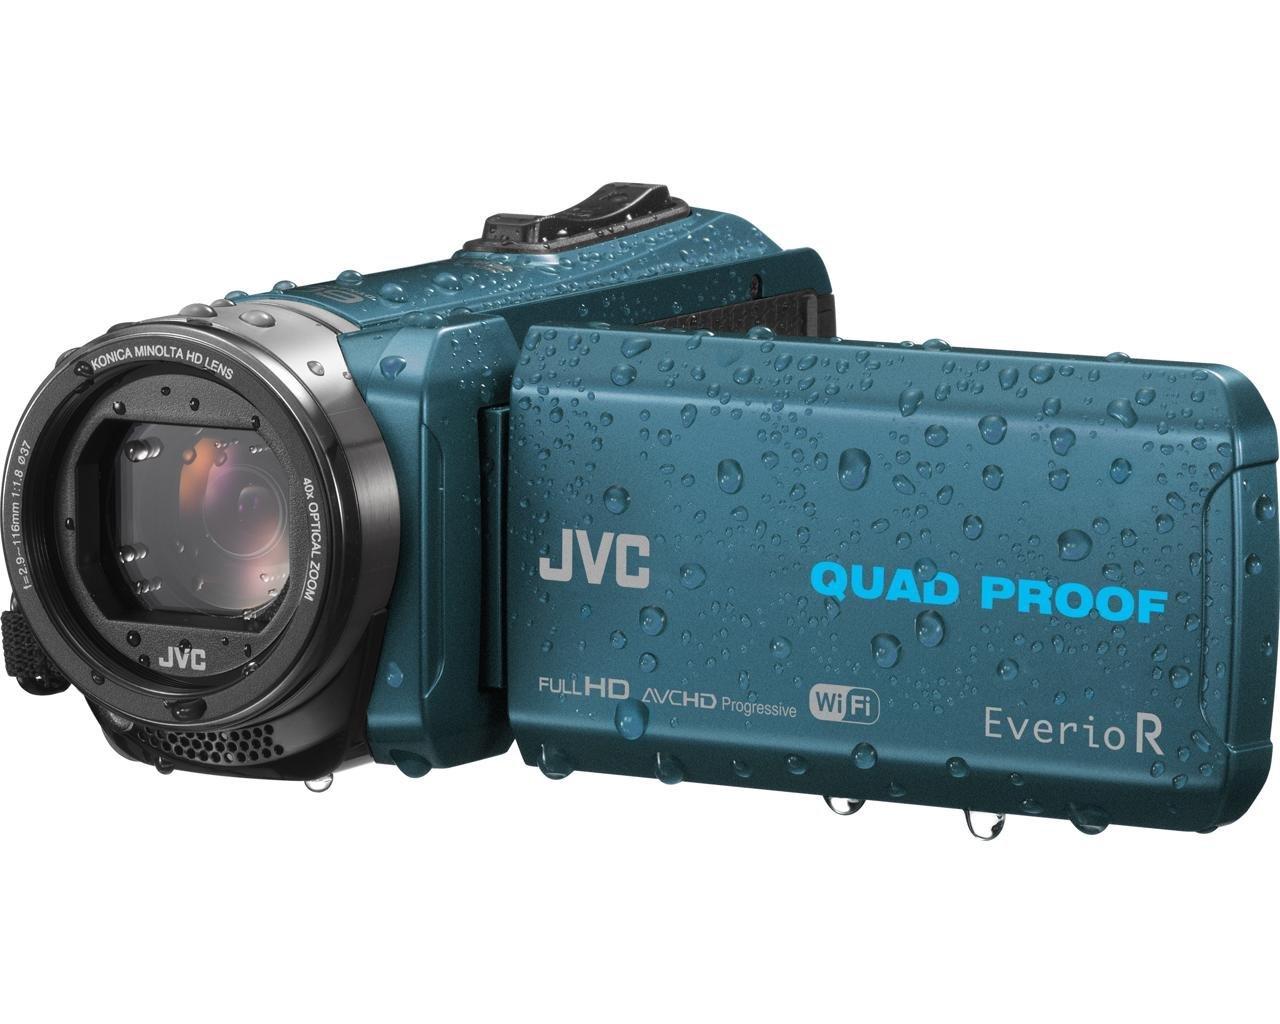 JVC Everio R Quad Proof Videocámara Sumergible, color azul